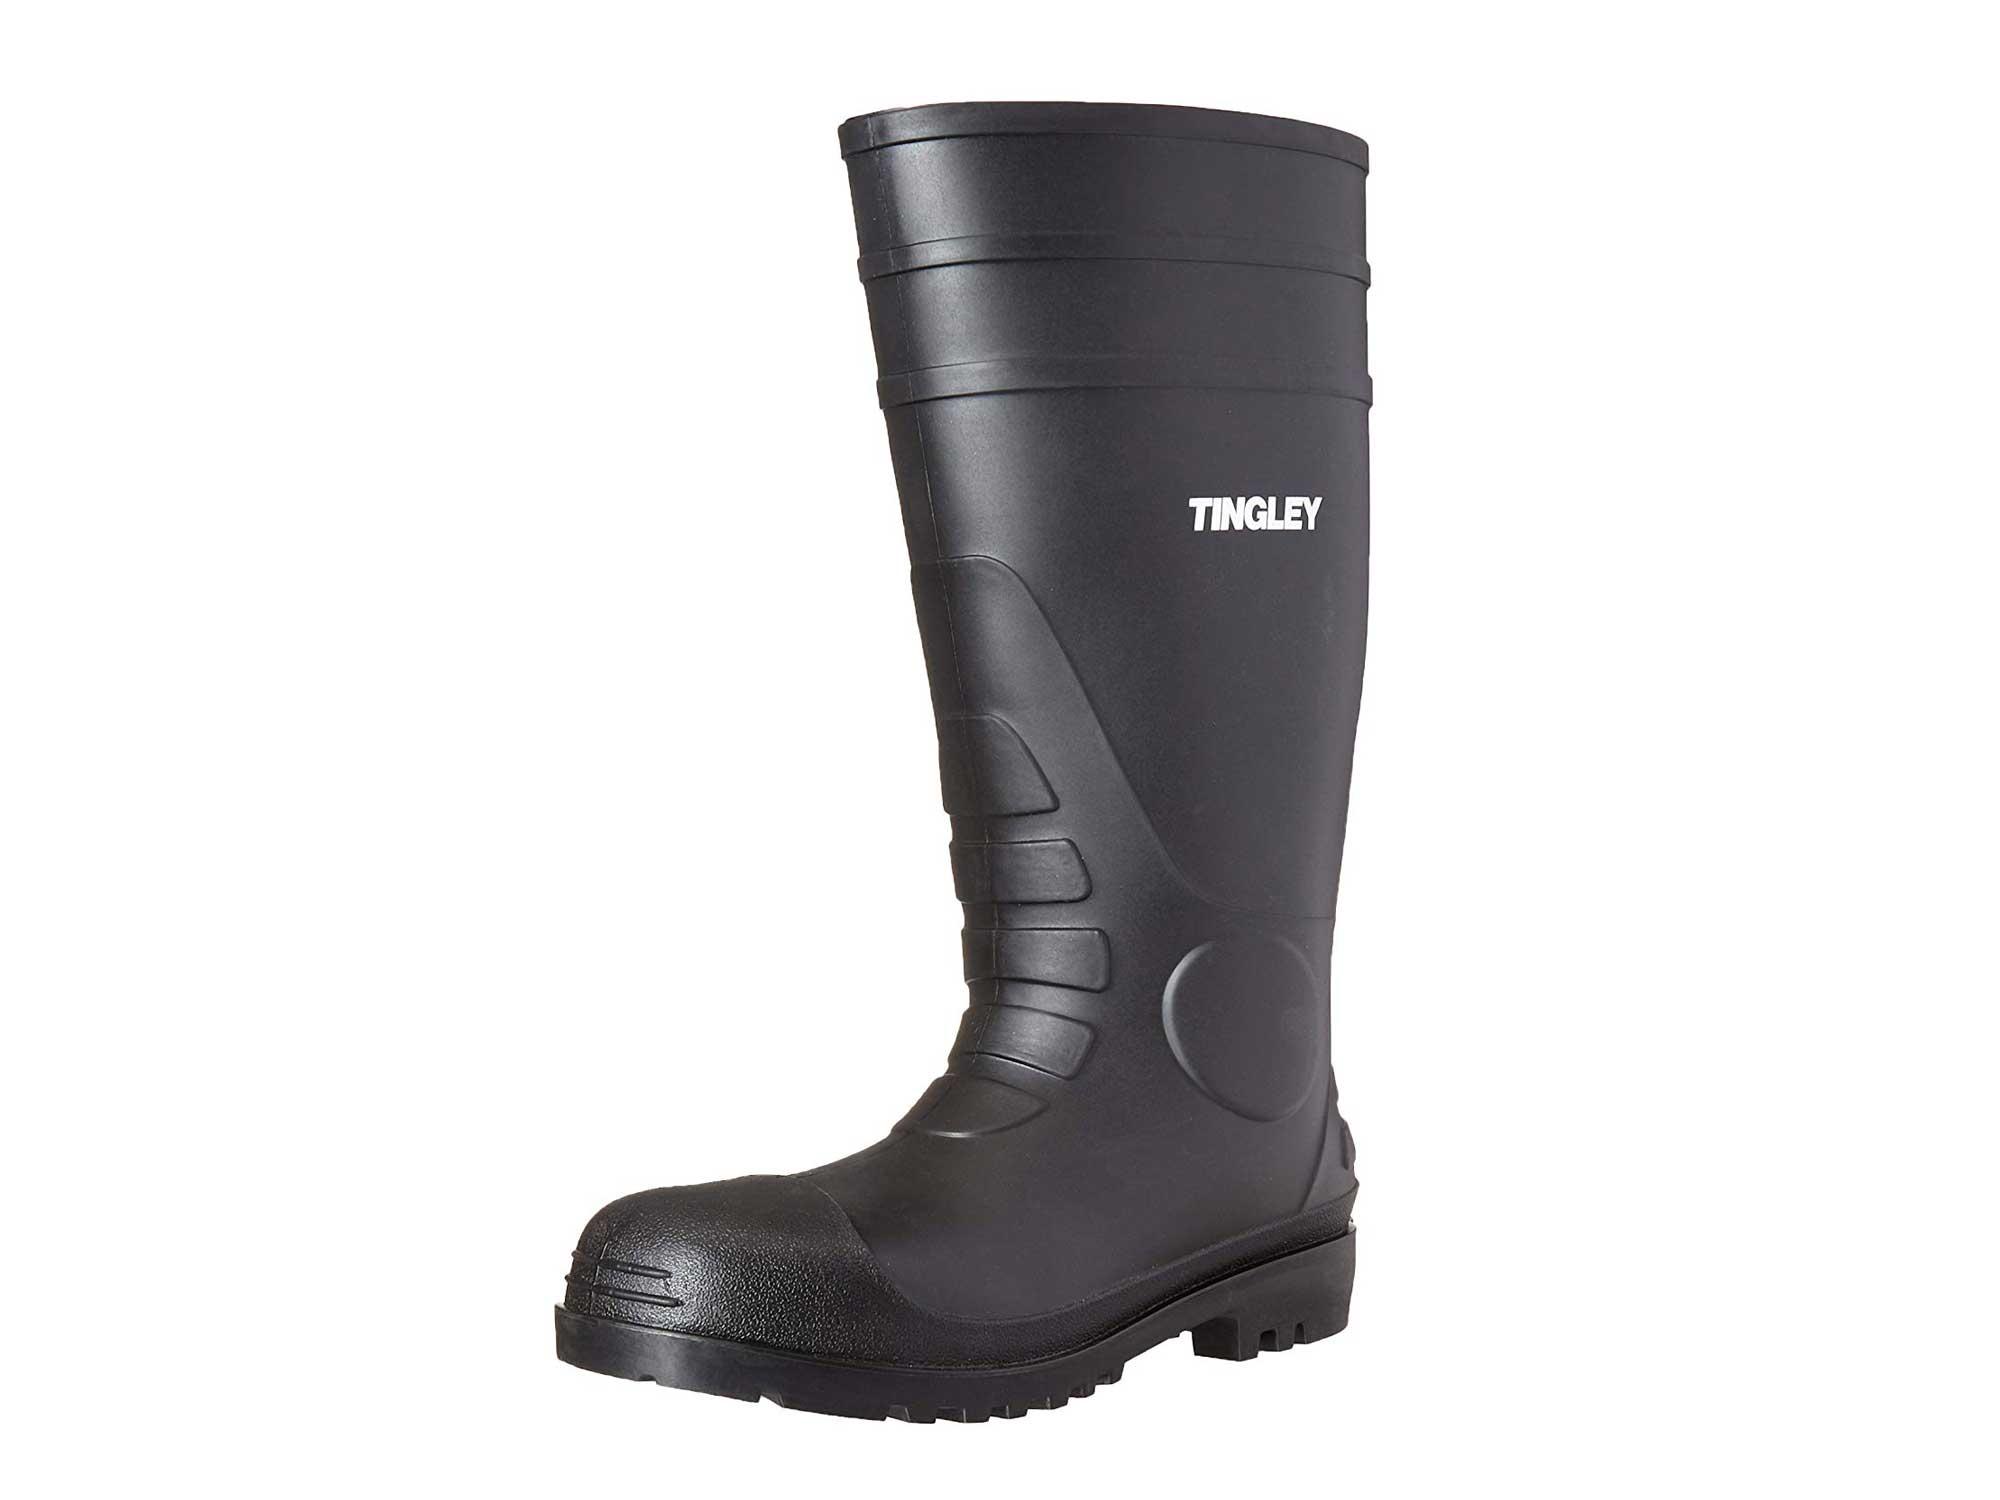 Tingley waterproof rubber boot